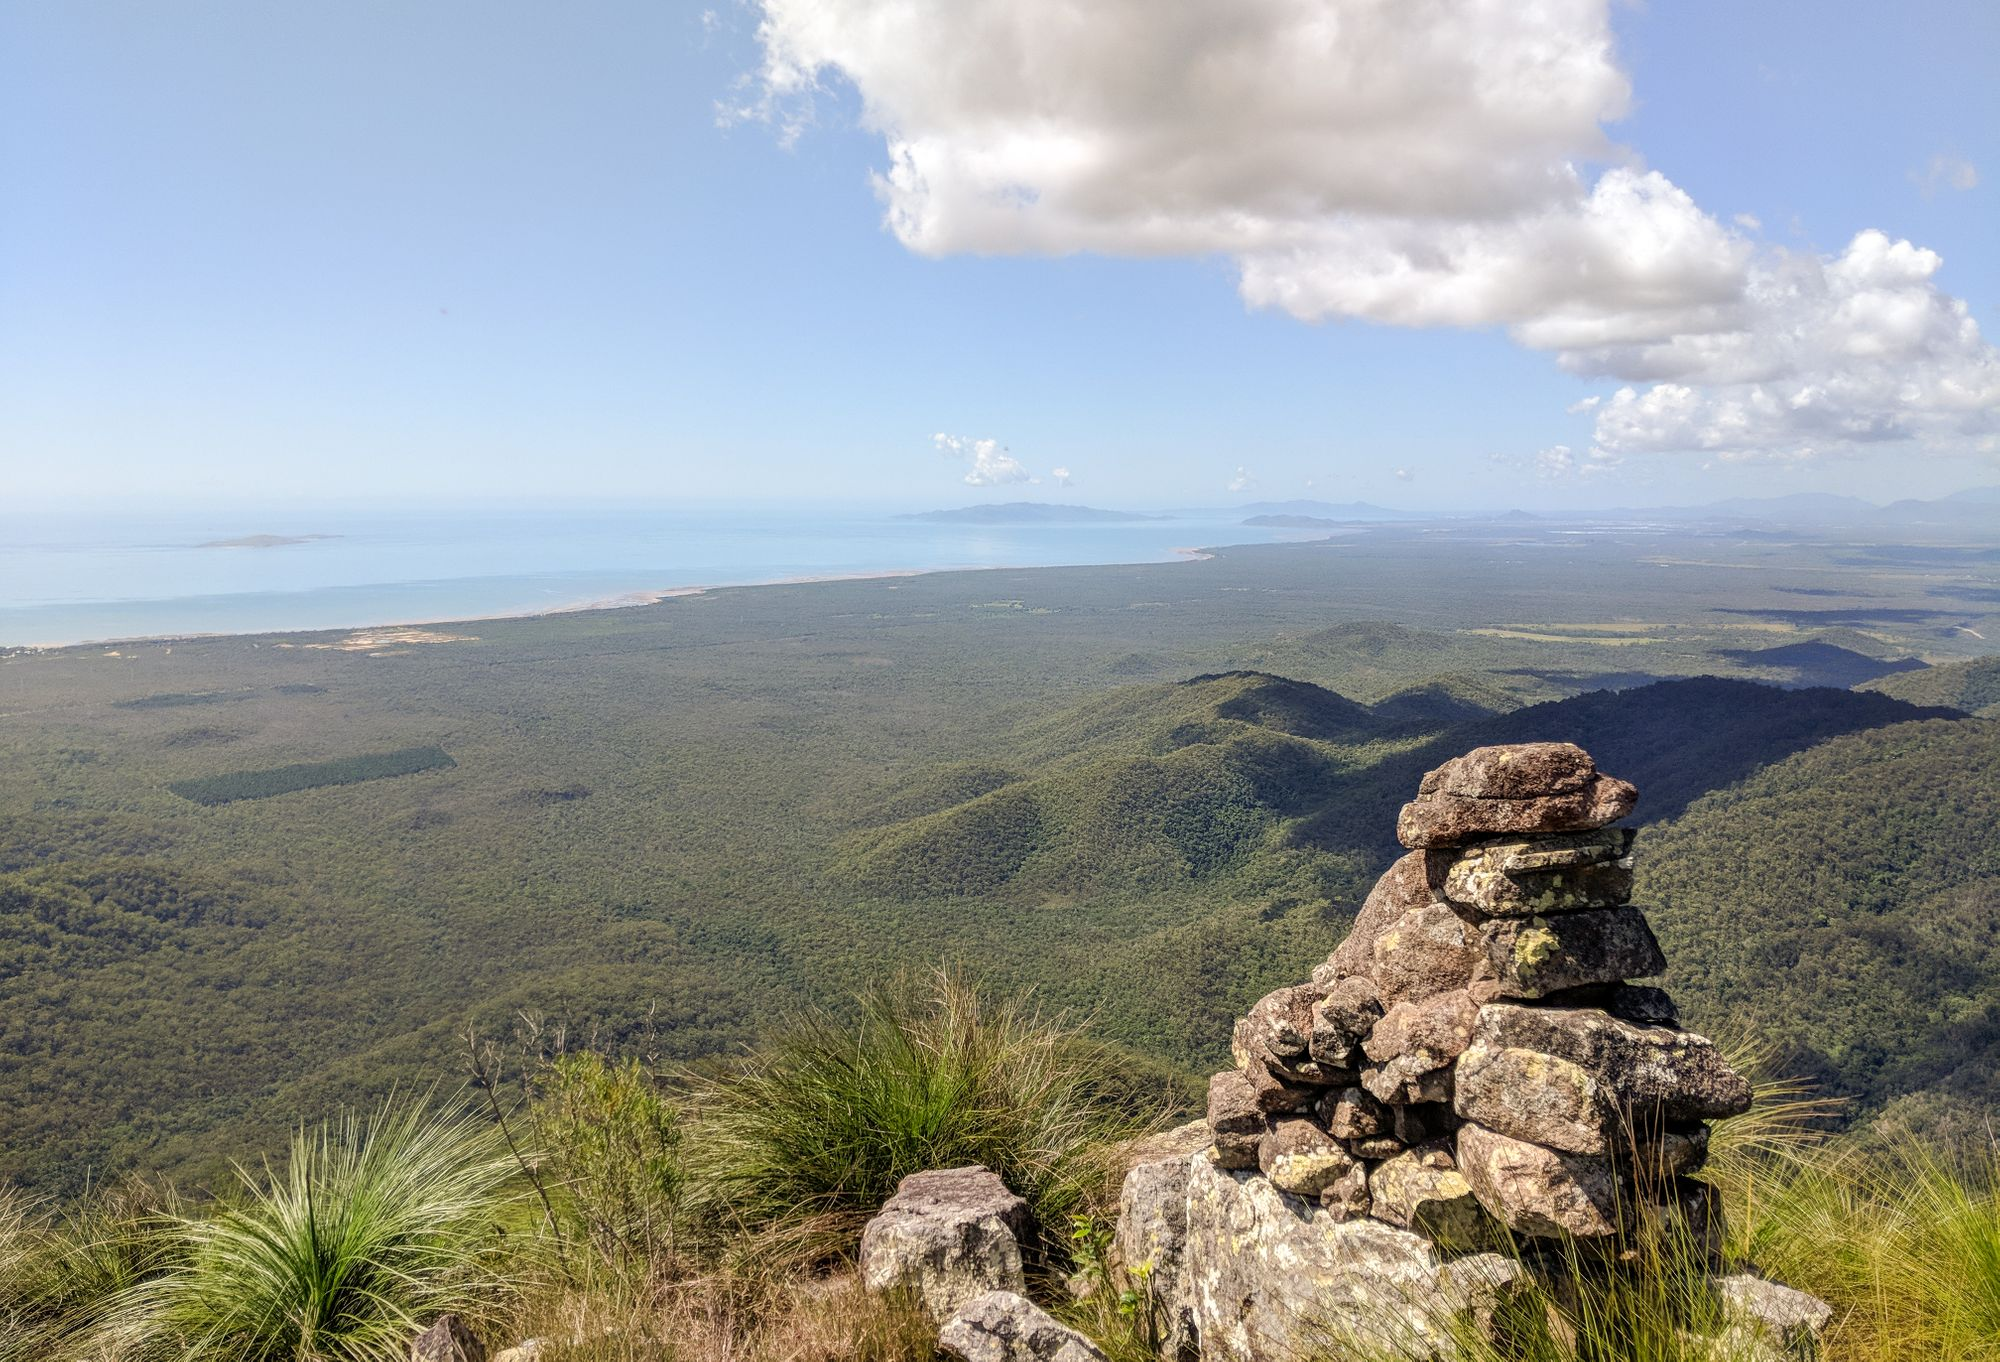 godwins peak summit